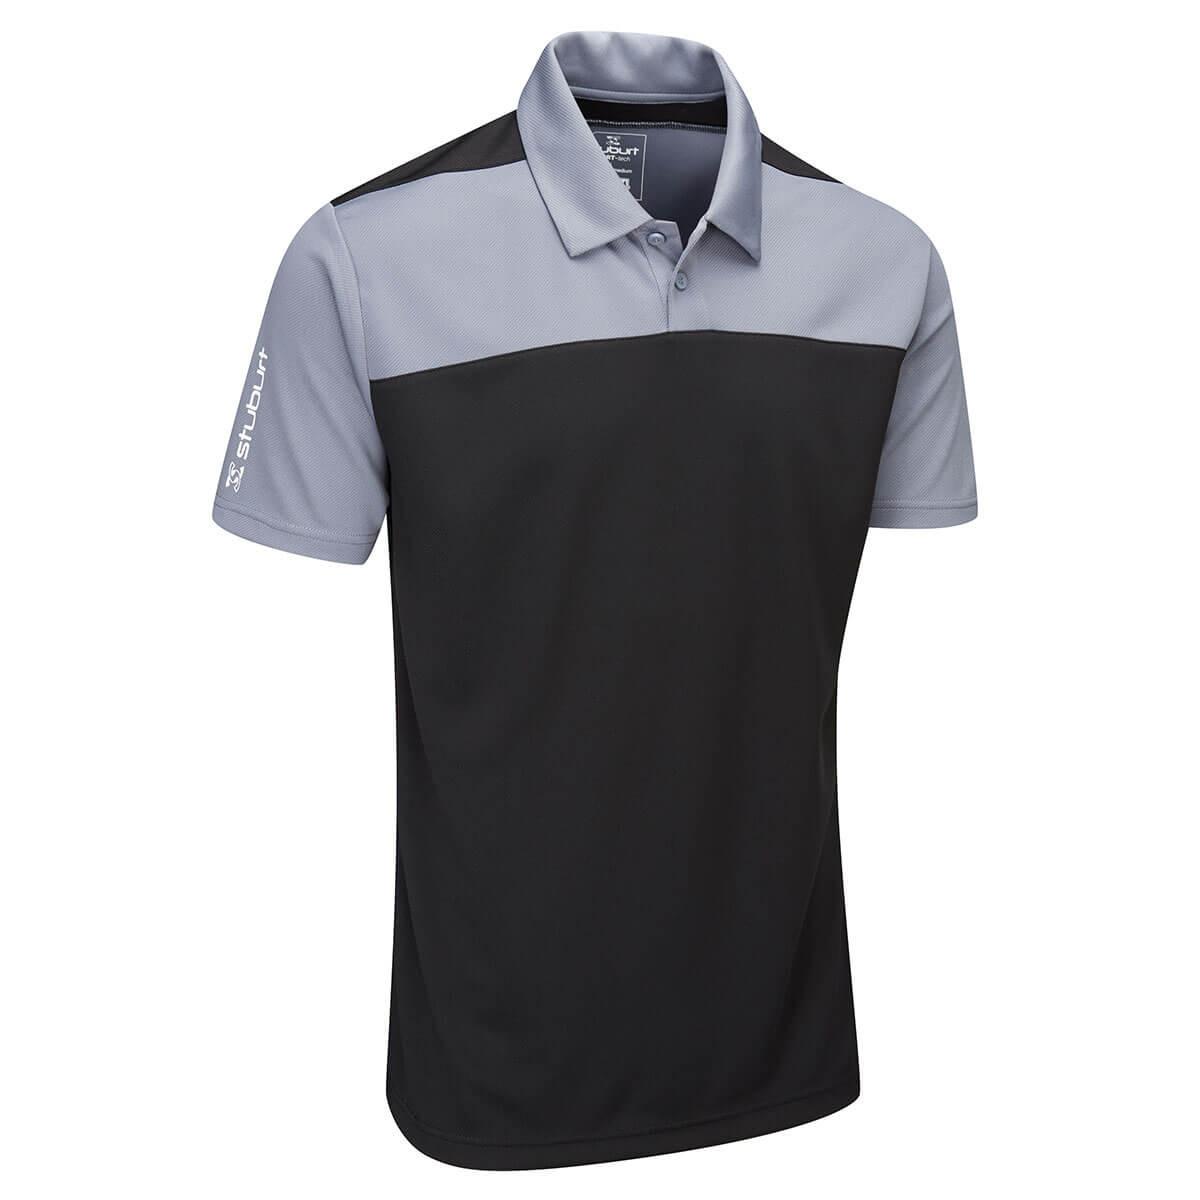 ce257e96 Stuburt Mens 2019 Sport Tech Leyburn Moisture Wicking Golf Polo Shirt